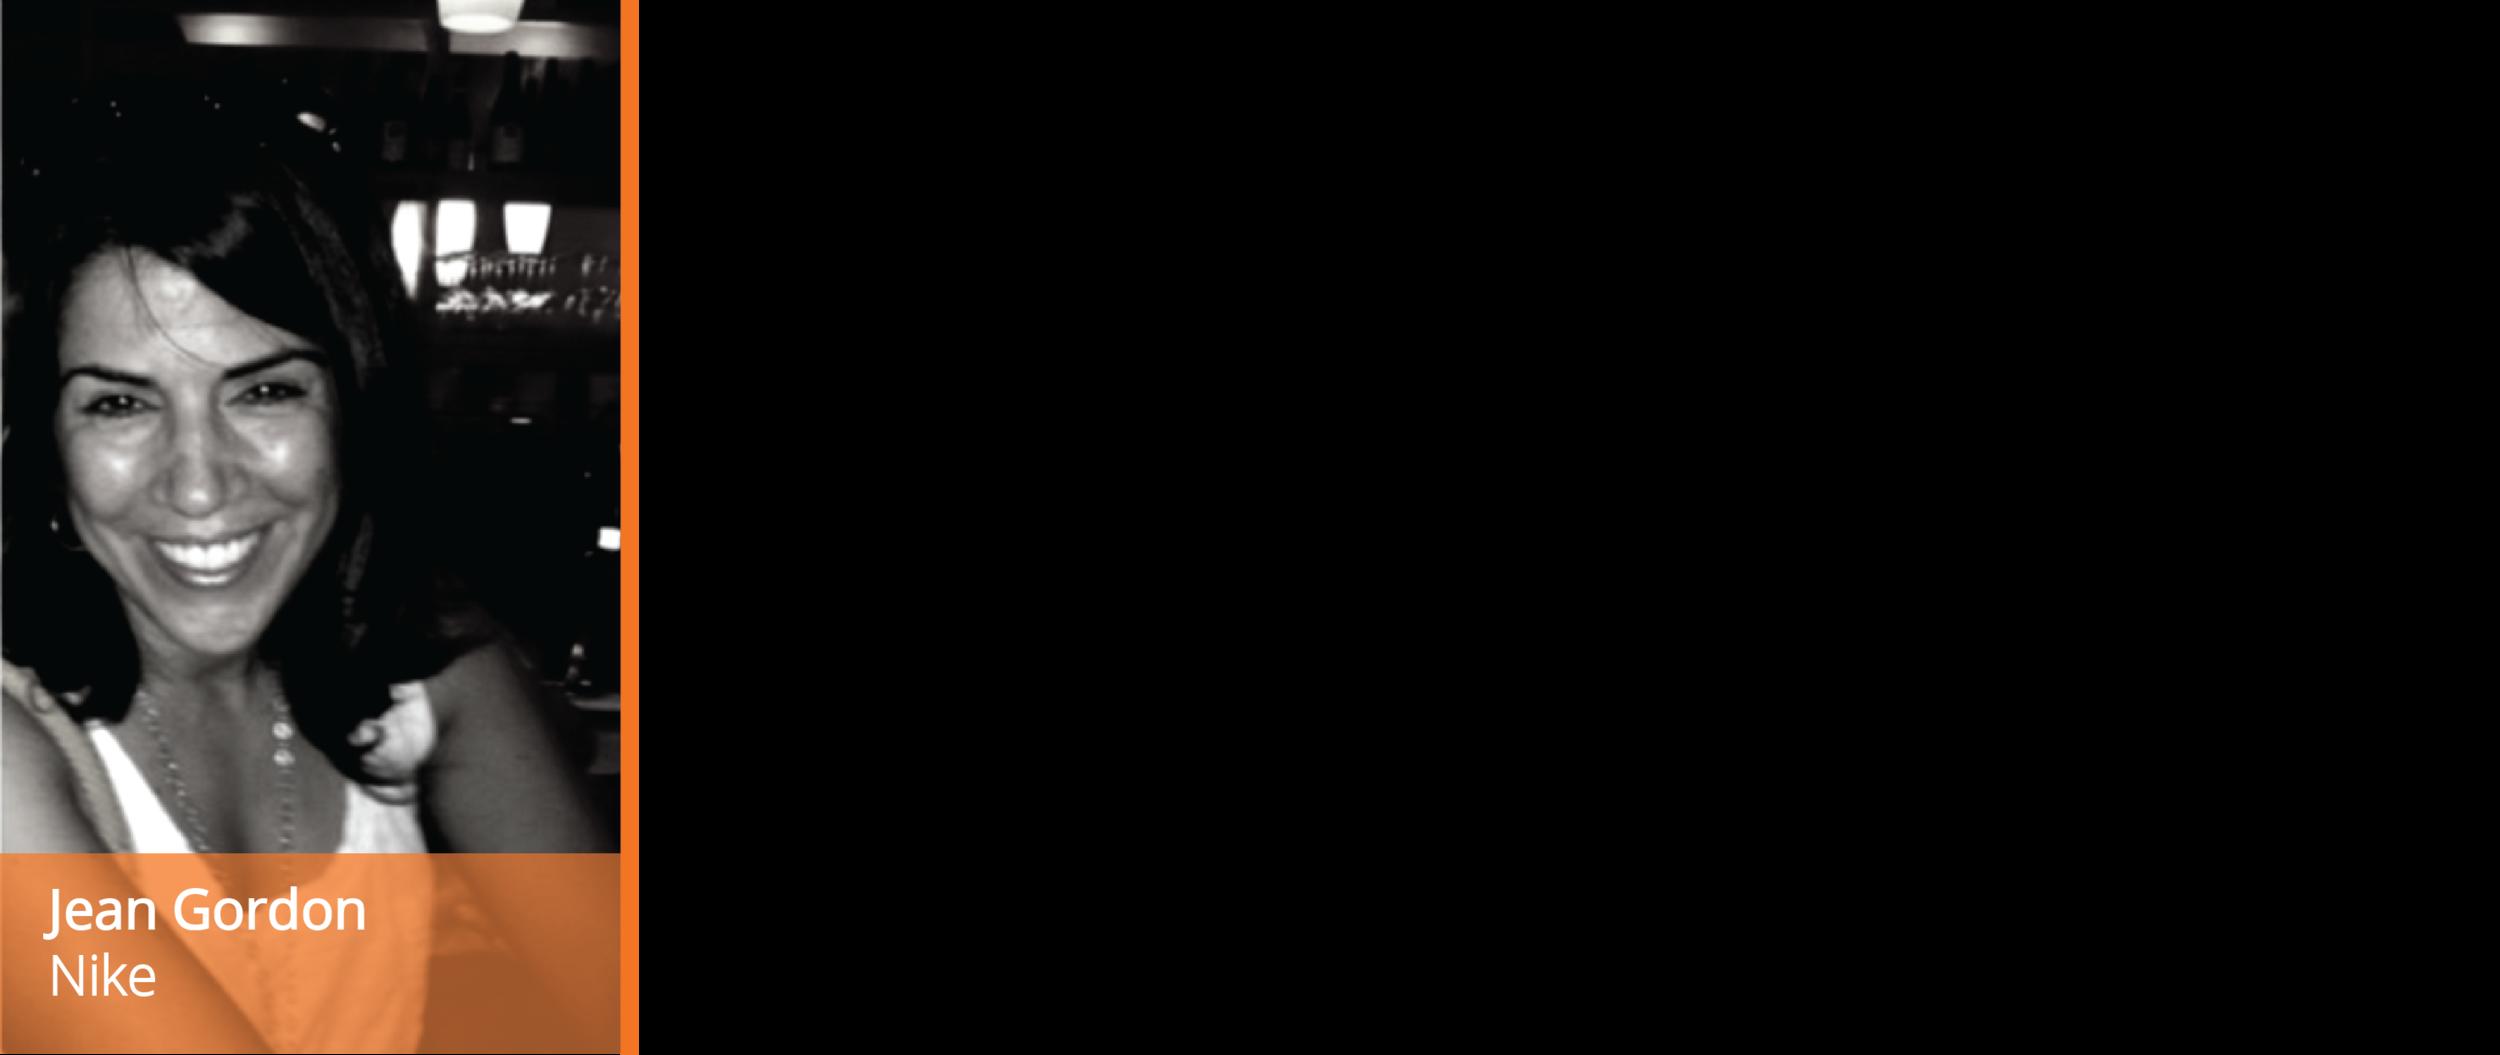 JG_05-04.png